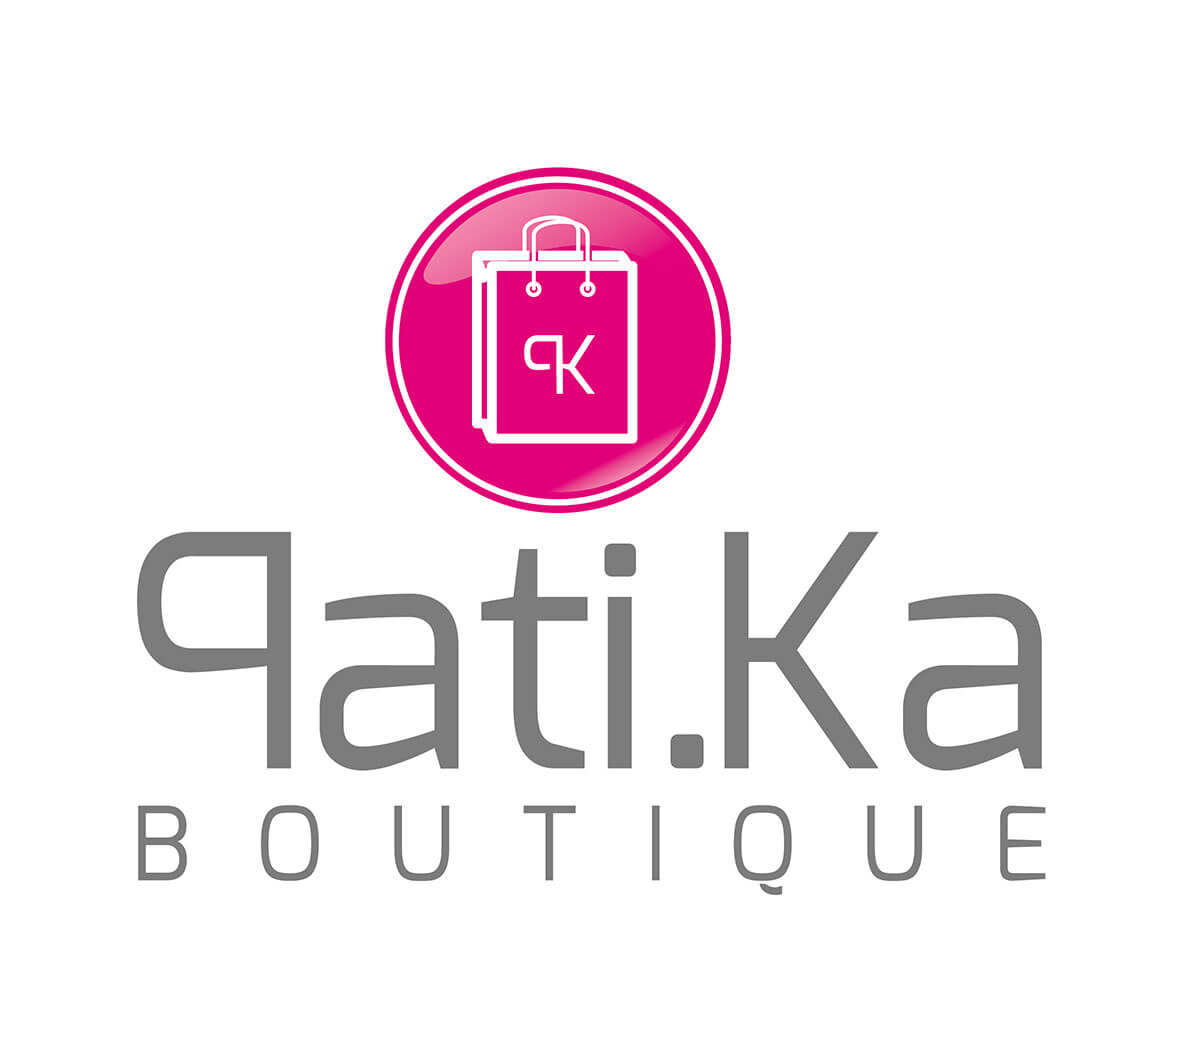 Pati.ka boutique